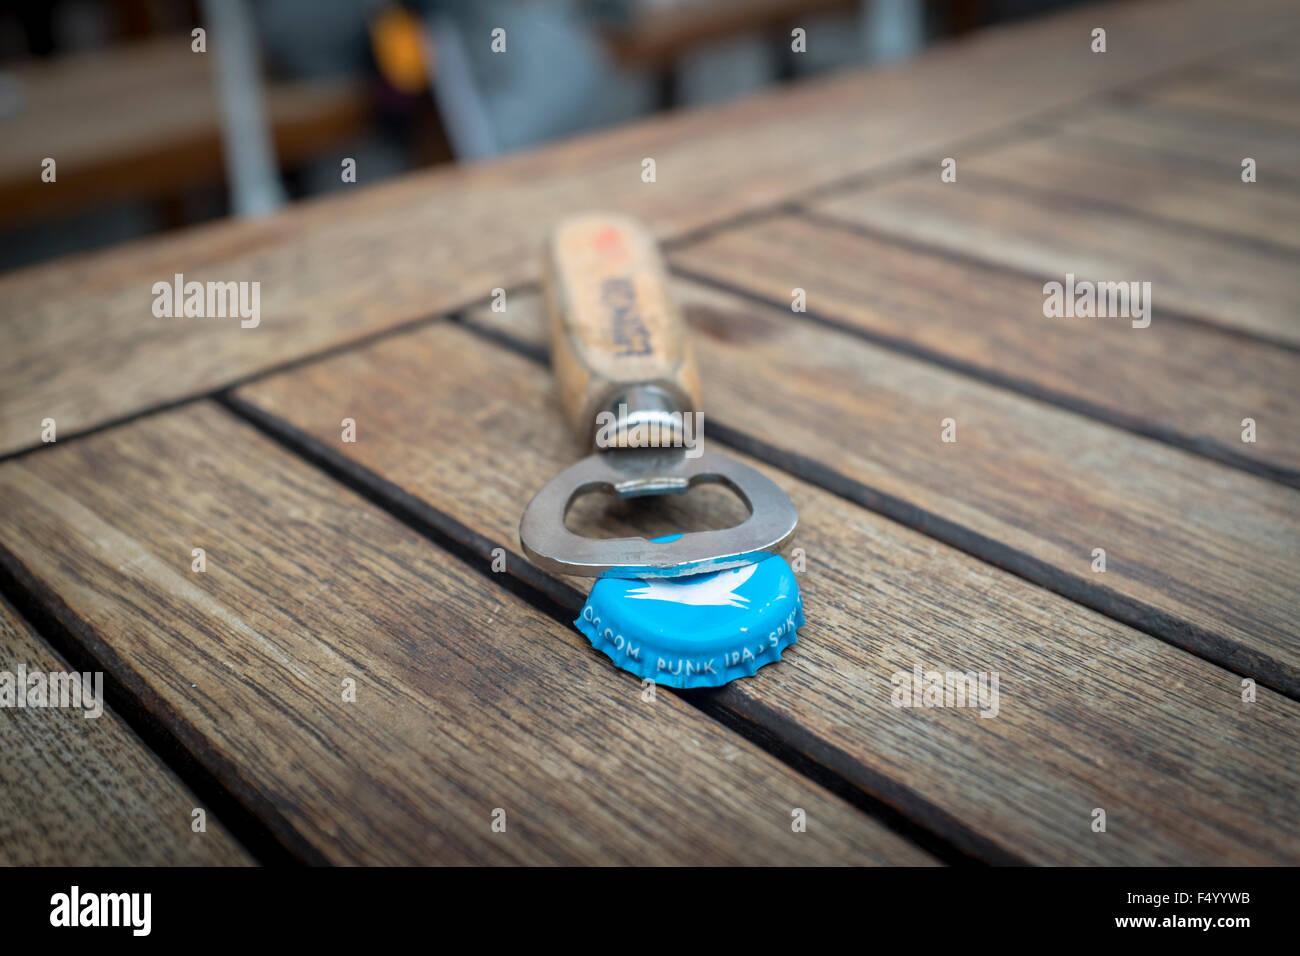 Bottle opener and Brewdog beer bottle cap - Stock Image